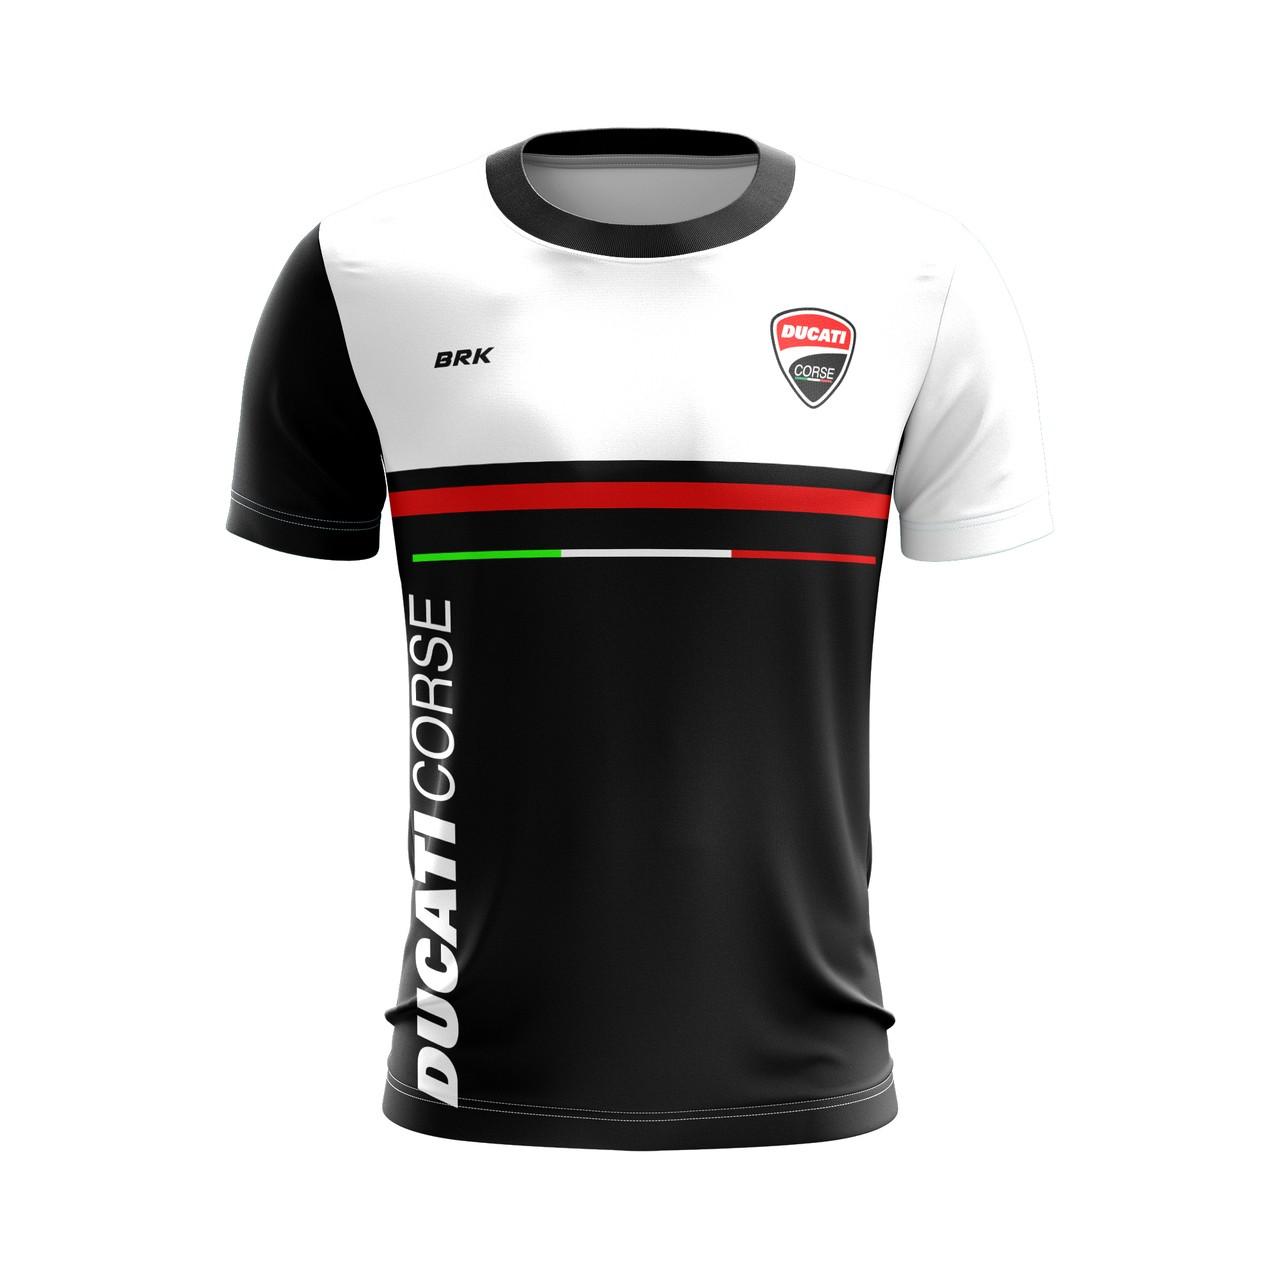 Camiseta Casual Brk Motociclismo Ducati Corse com FPU 50+